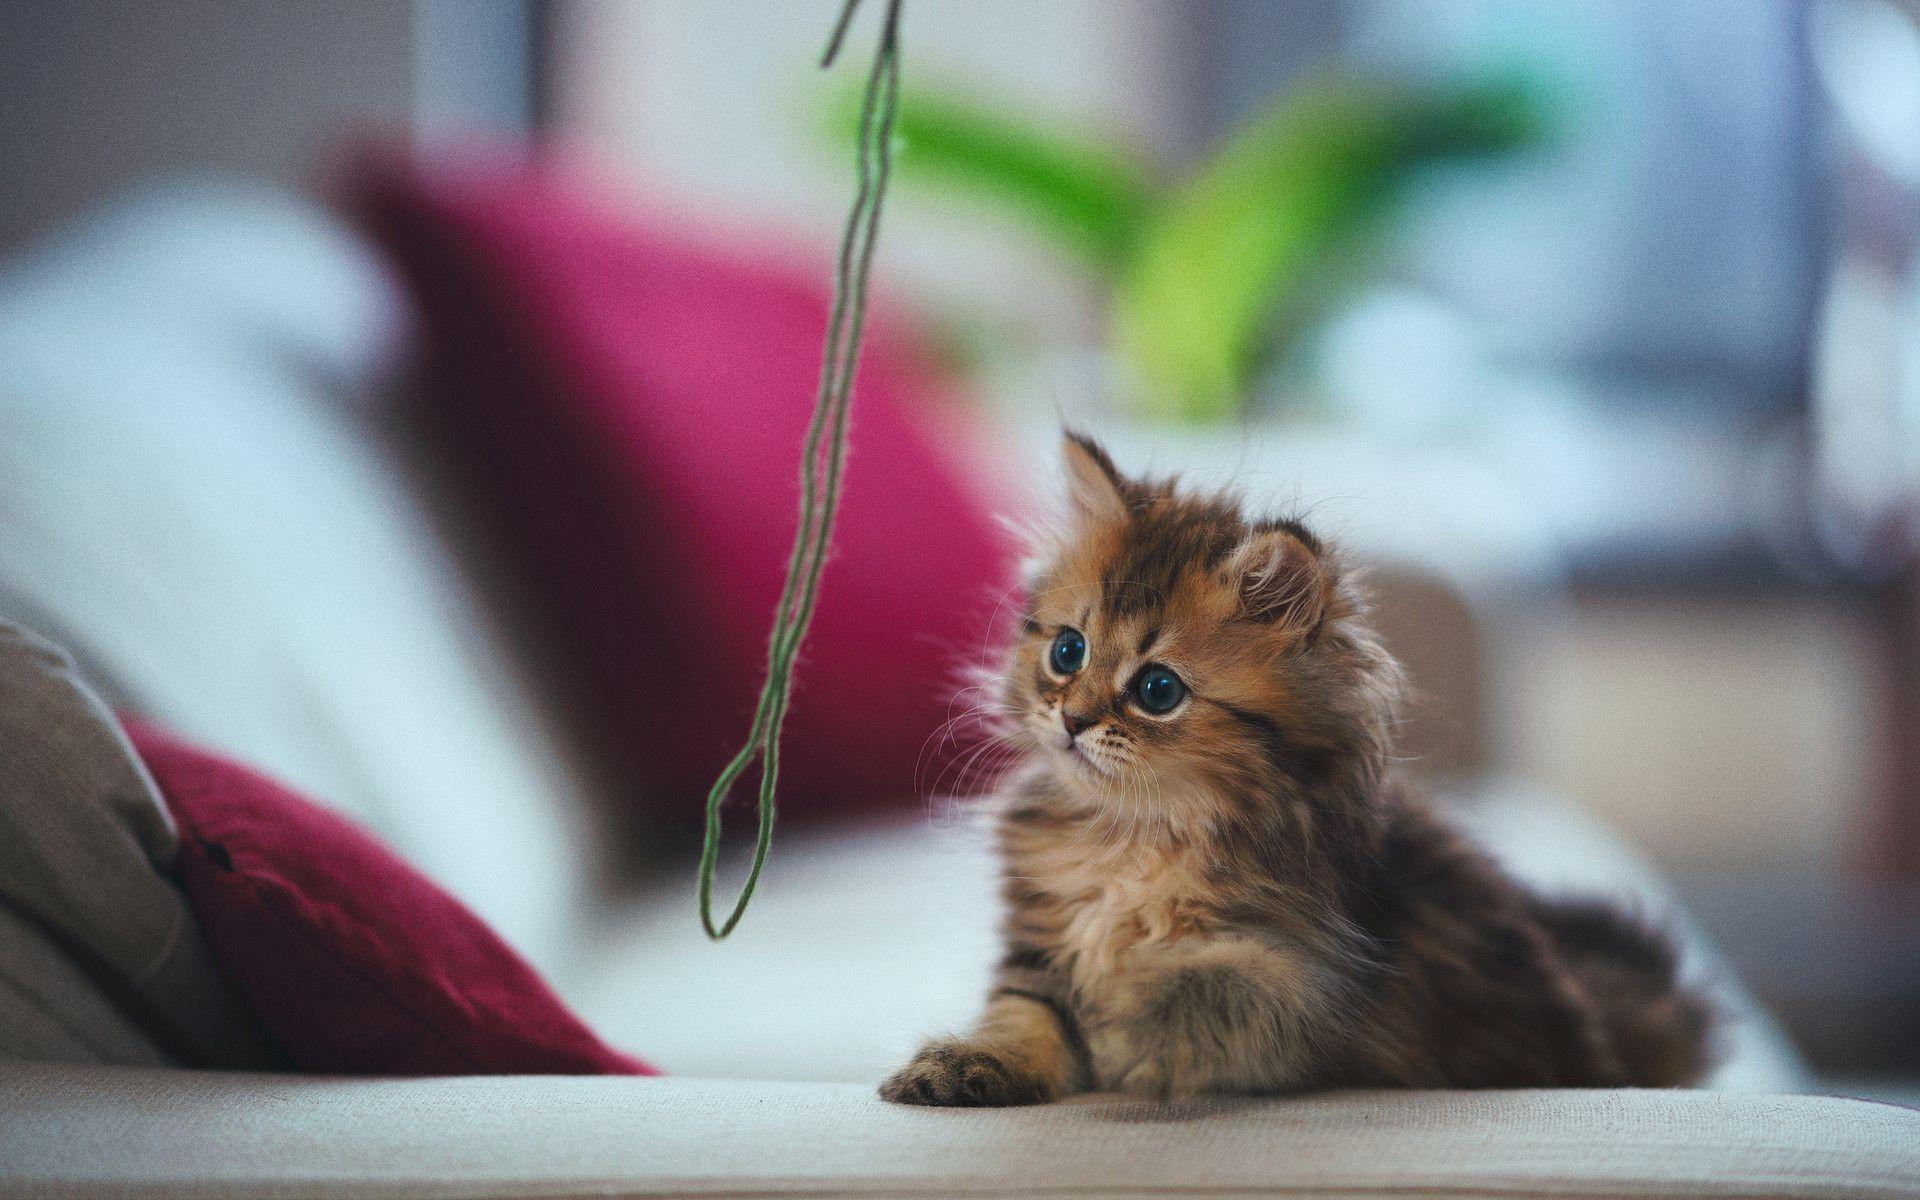 The Cutest Cat In The World Daisy By Ben Torode Post Kittens Cutest Cute Little Kittens Cutest Kittens Ever